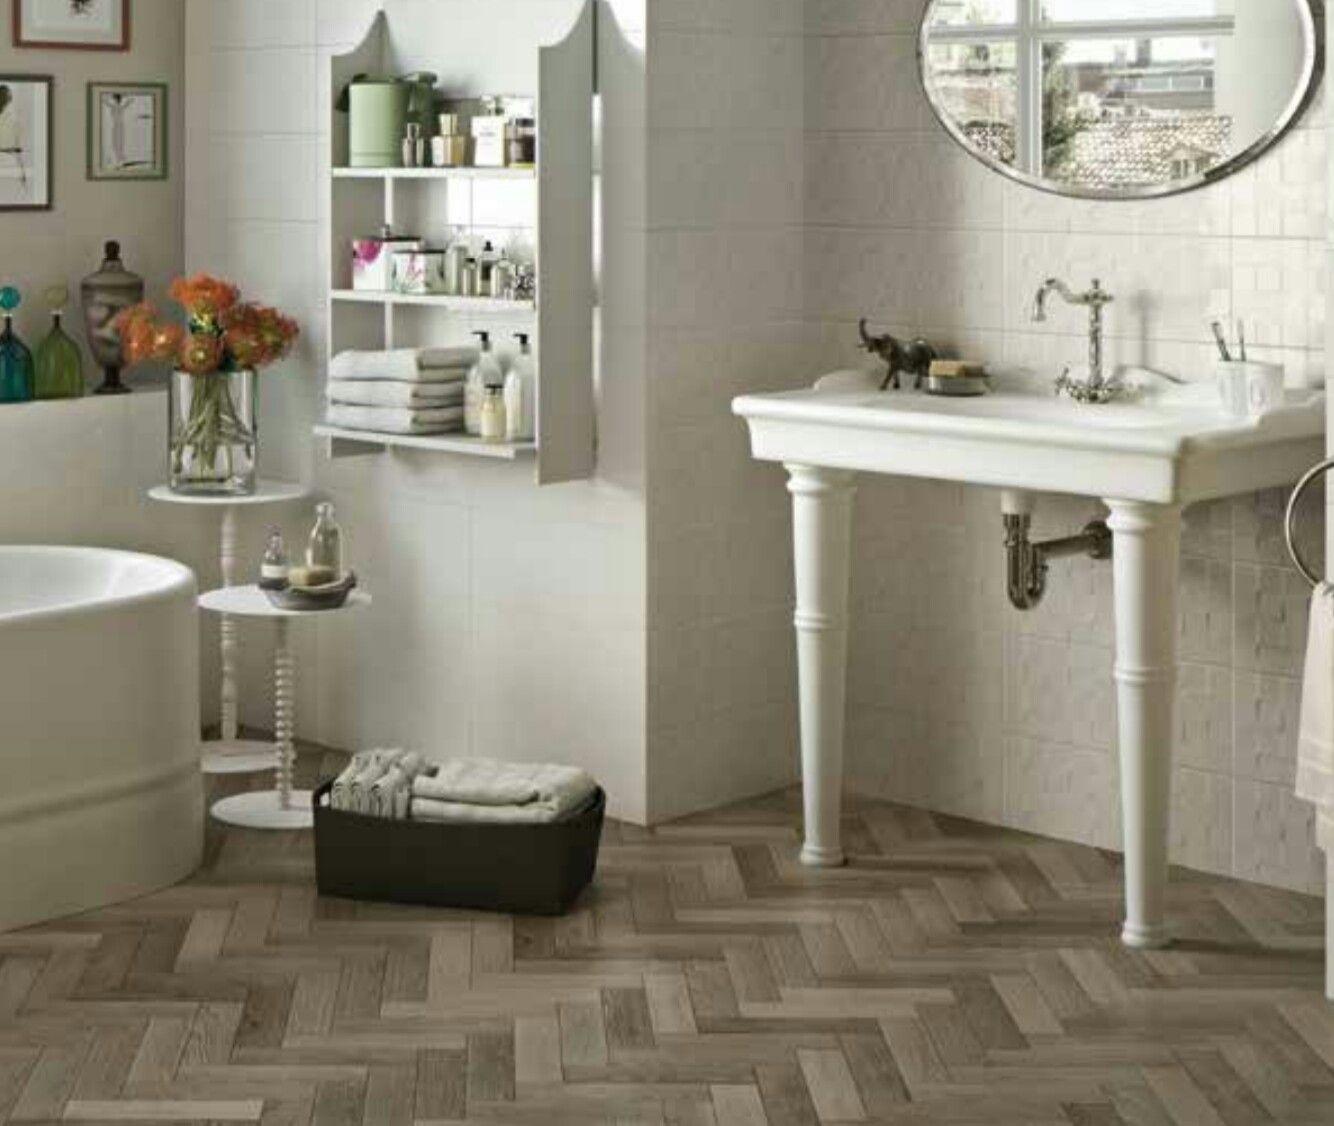 french parquet 7x28 taupe  bathroom floor tiles bathroom